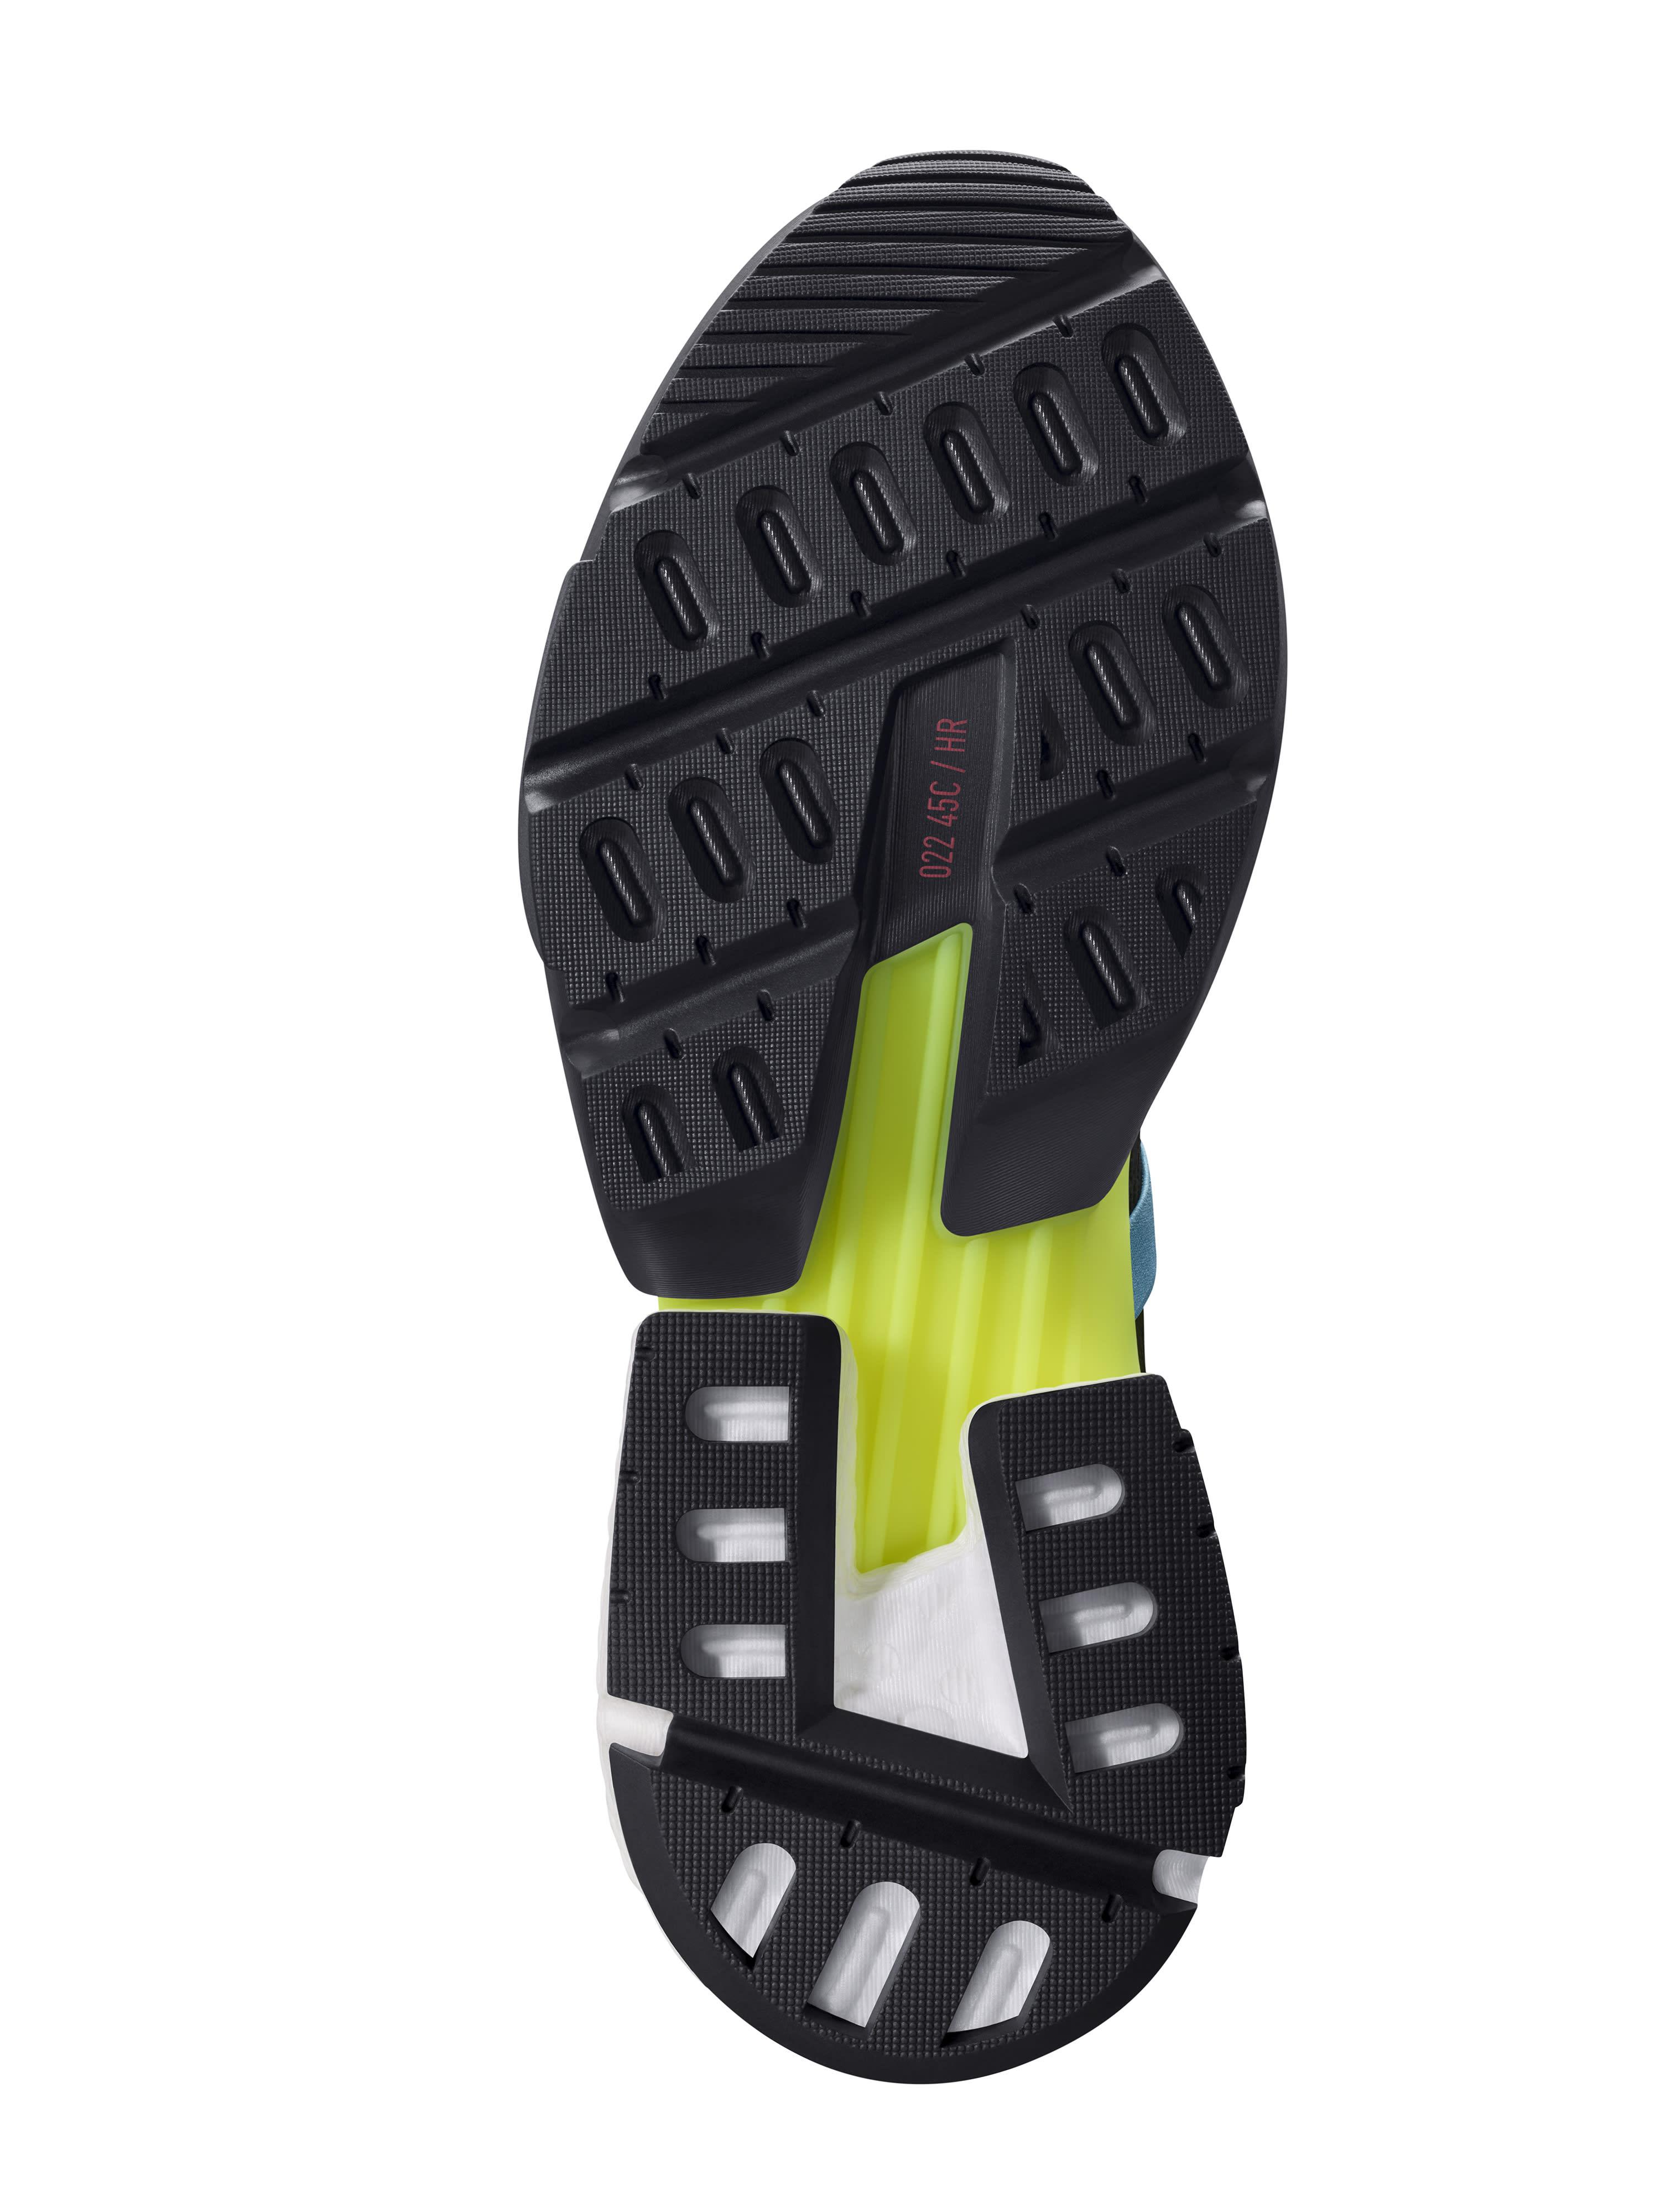 Adidas P.O.D. System AQ1059 (Bottom 2)